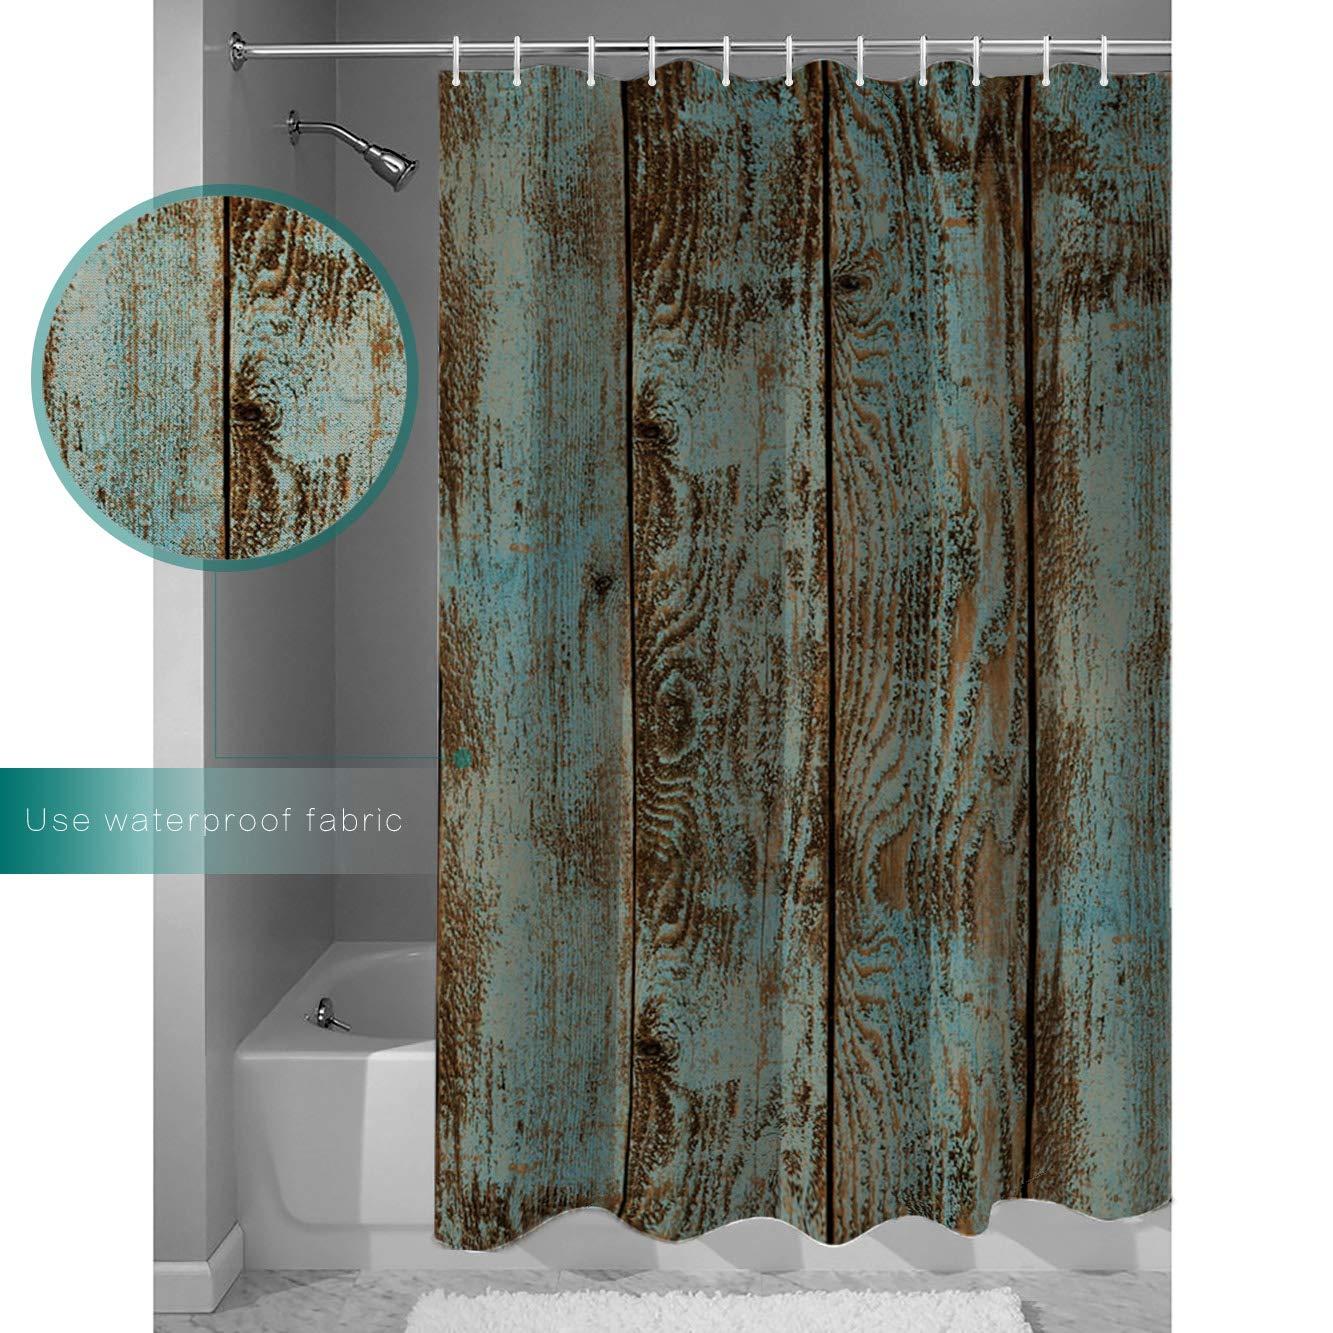 Amazon Customize Shower Curtain Retro Wood Grain Waterproof Polyester Fabric Bathroom Decor 72x84inch Home Kitchen